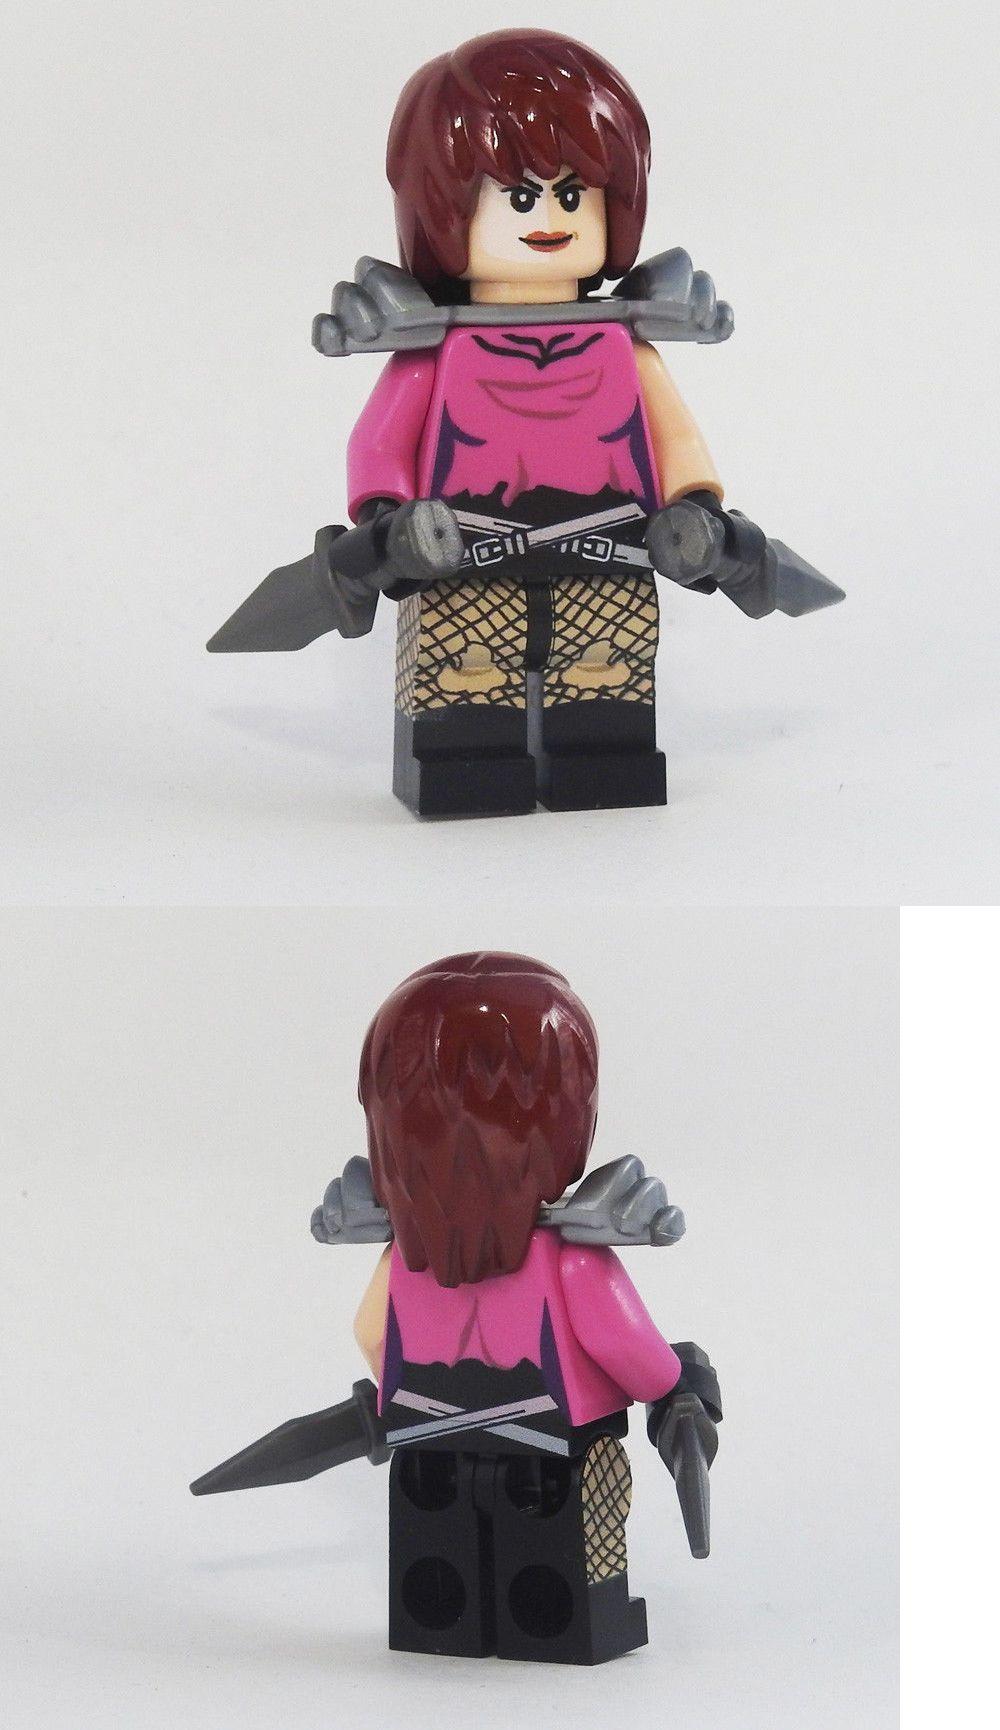 Blade Vampire Killer Drakula Marvel SuperHero Minifigur Compatible Set fur Lego